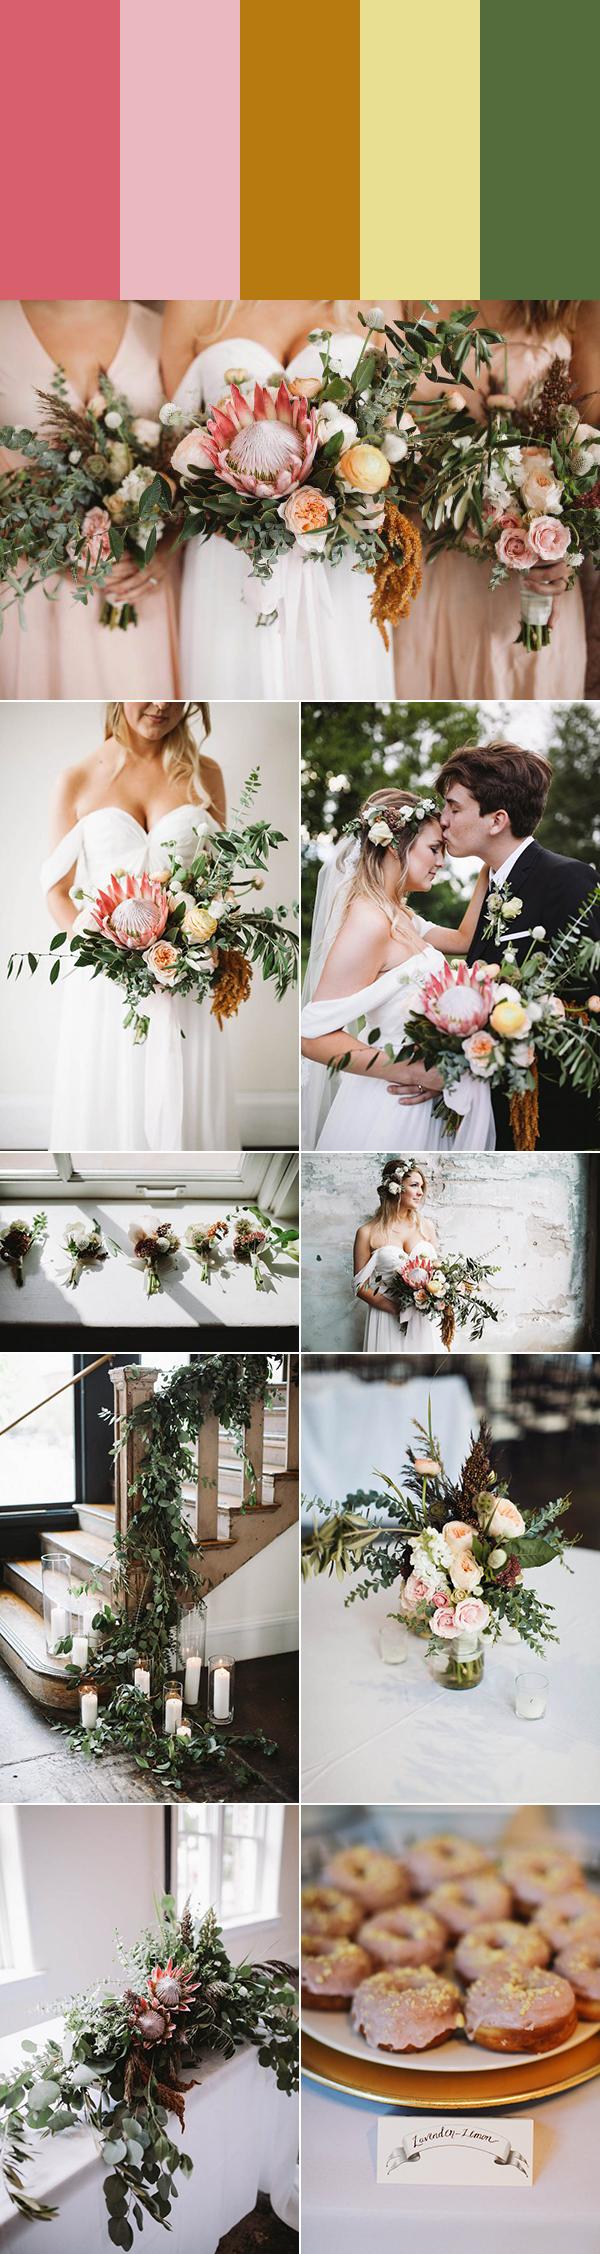 5 Rustic Wedding Color Palette Ideas | Rustic wedding colors, Ranch ...